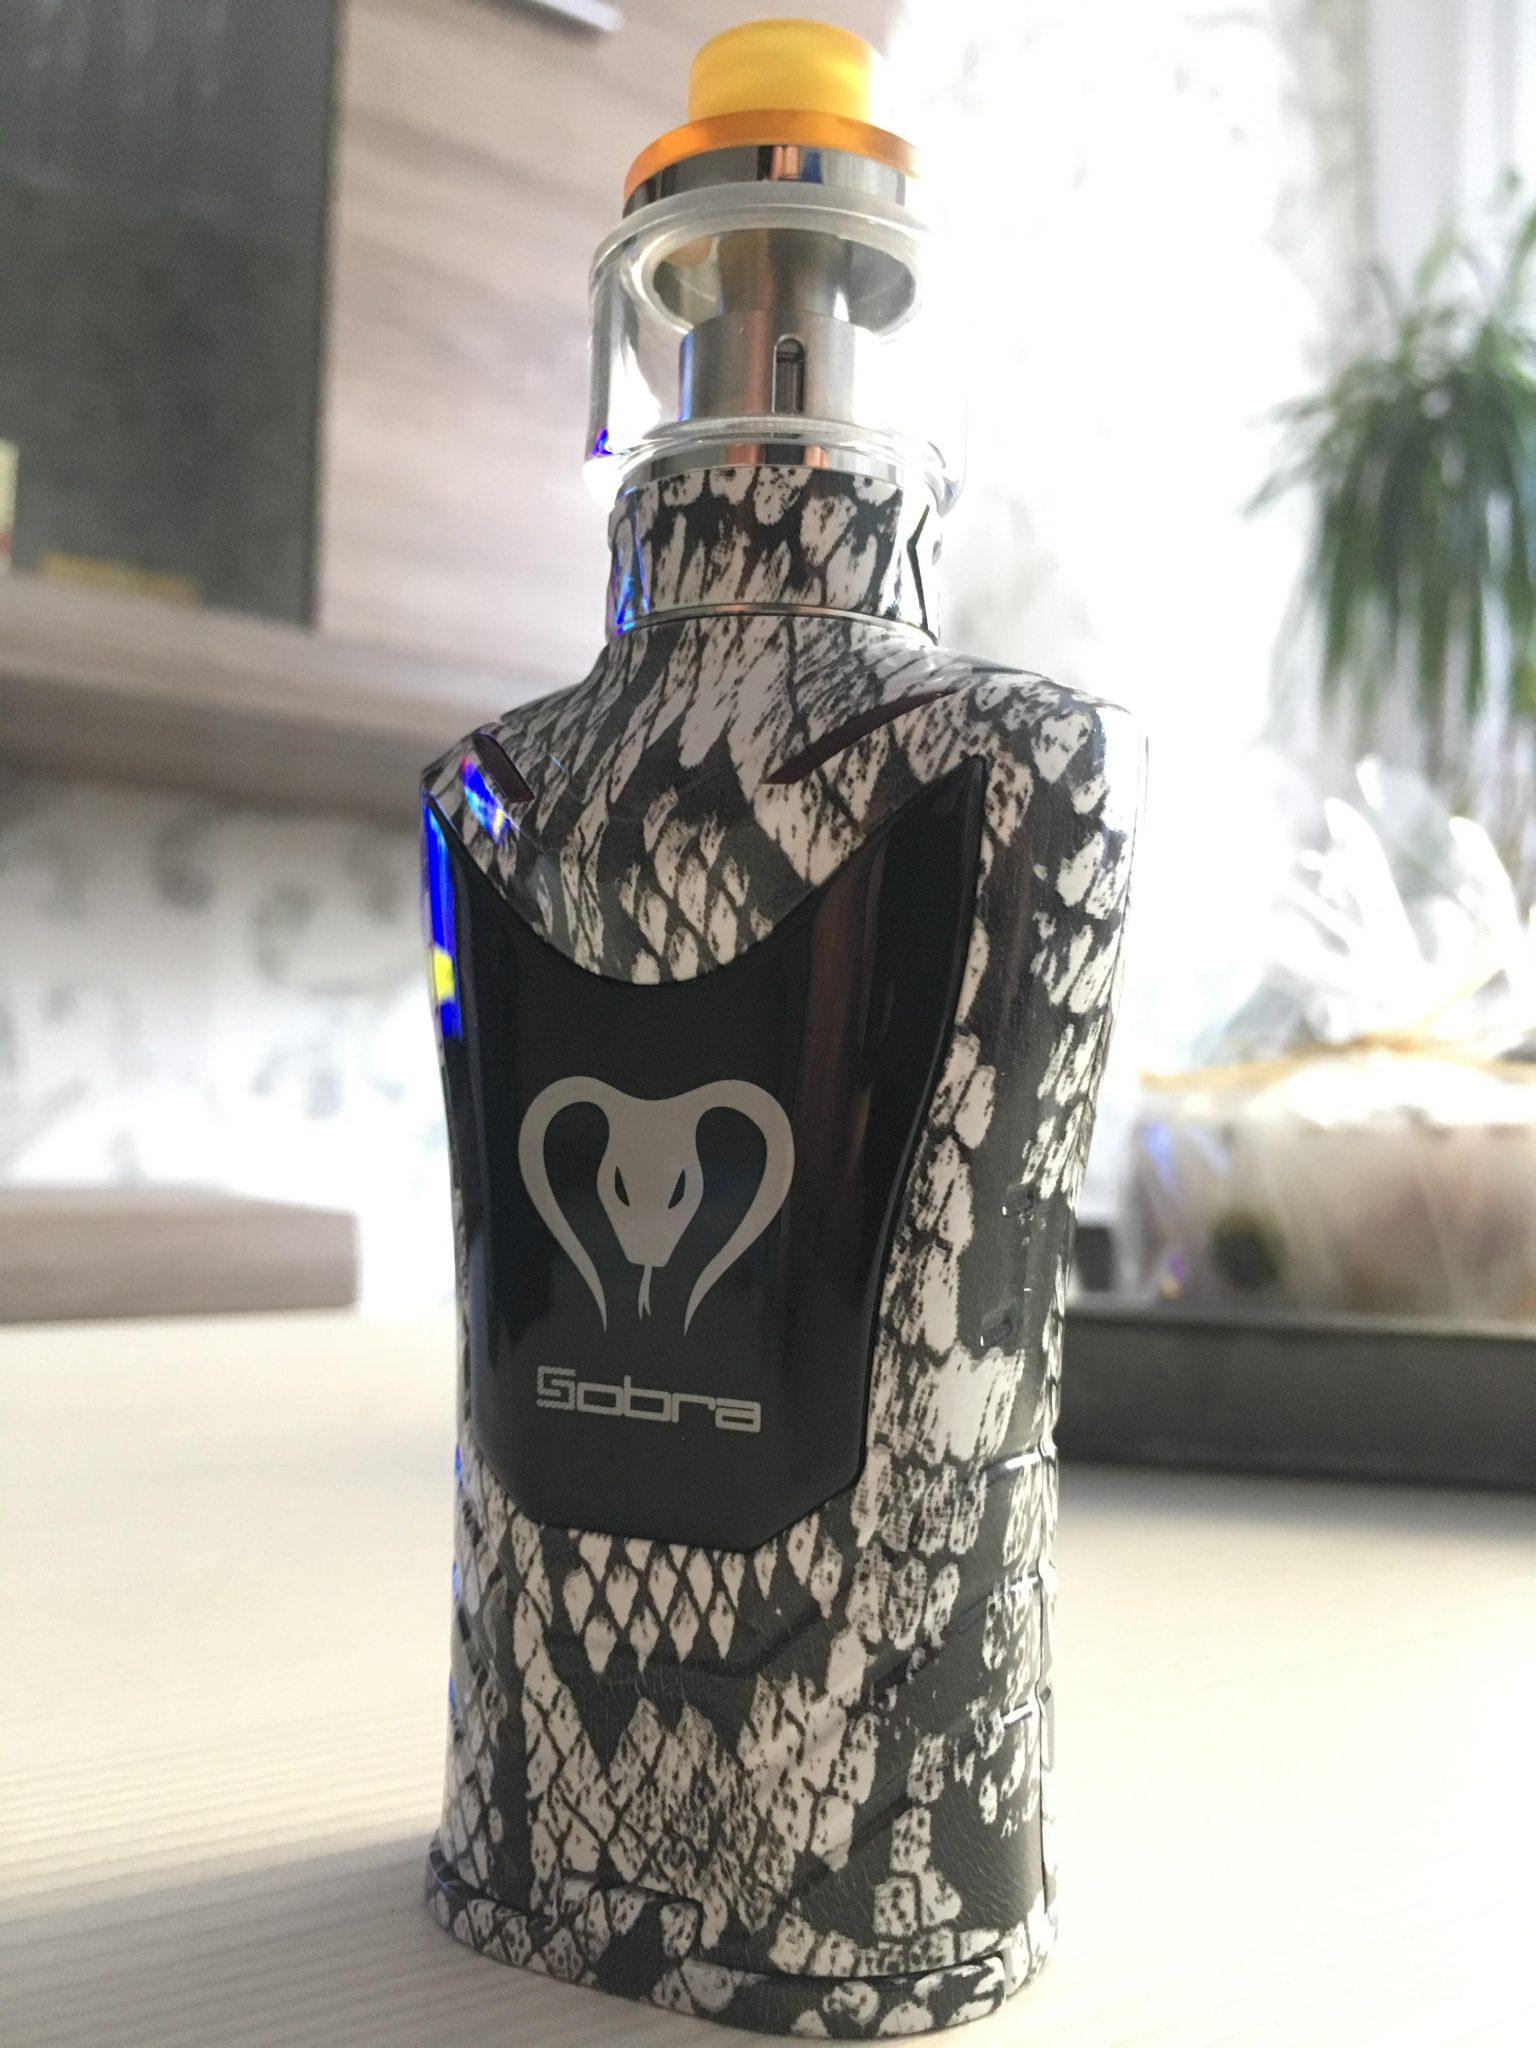 Sigelei Sobra Kit Review